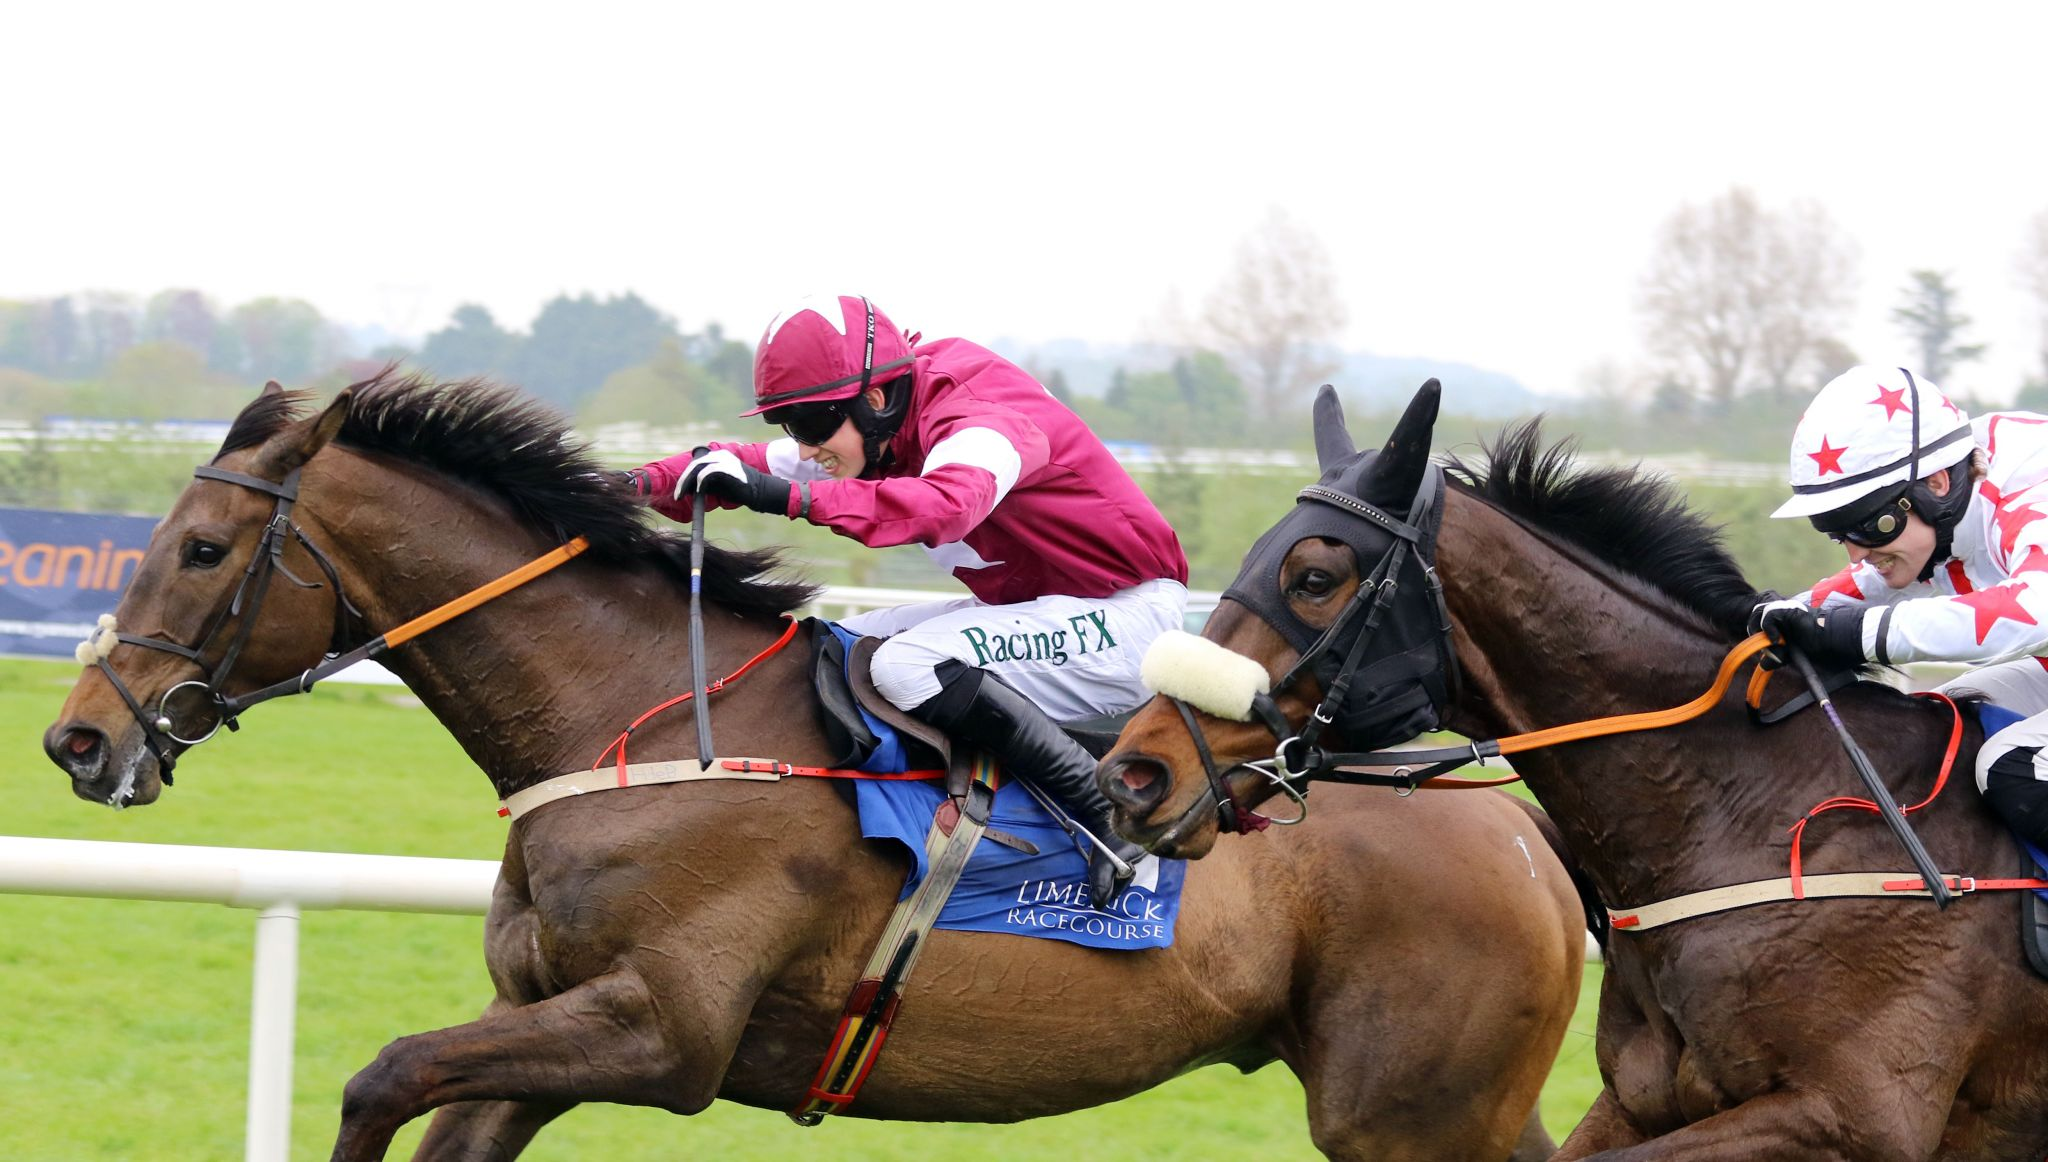 Horse Racing Balzac